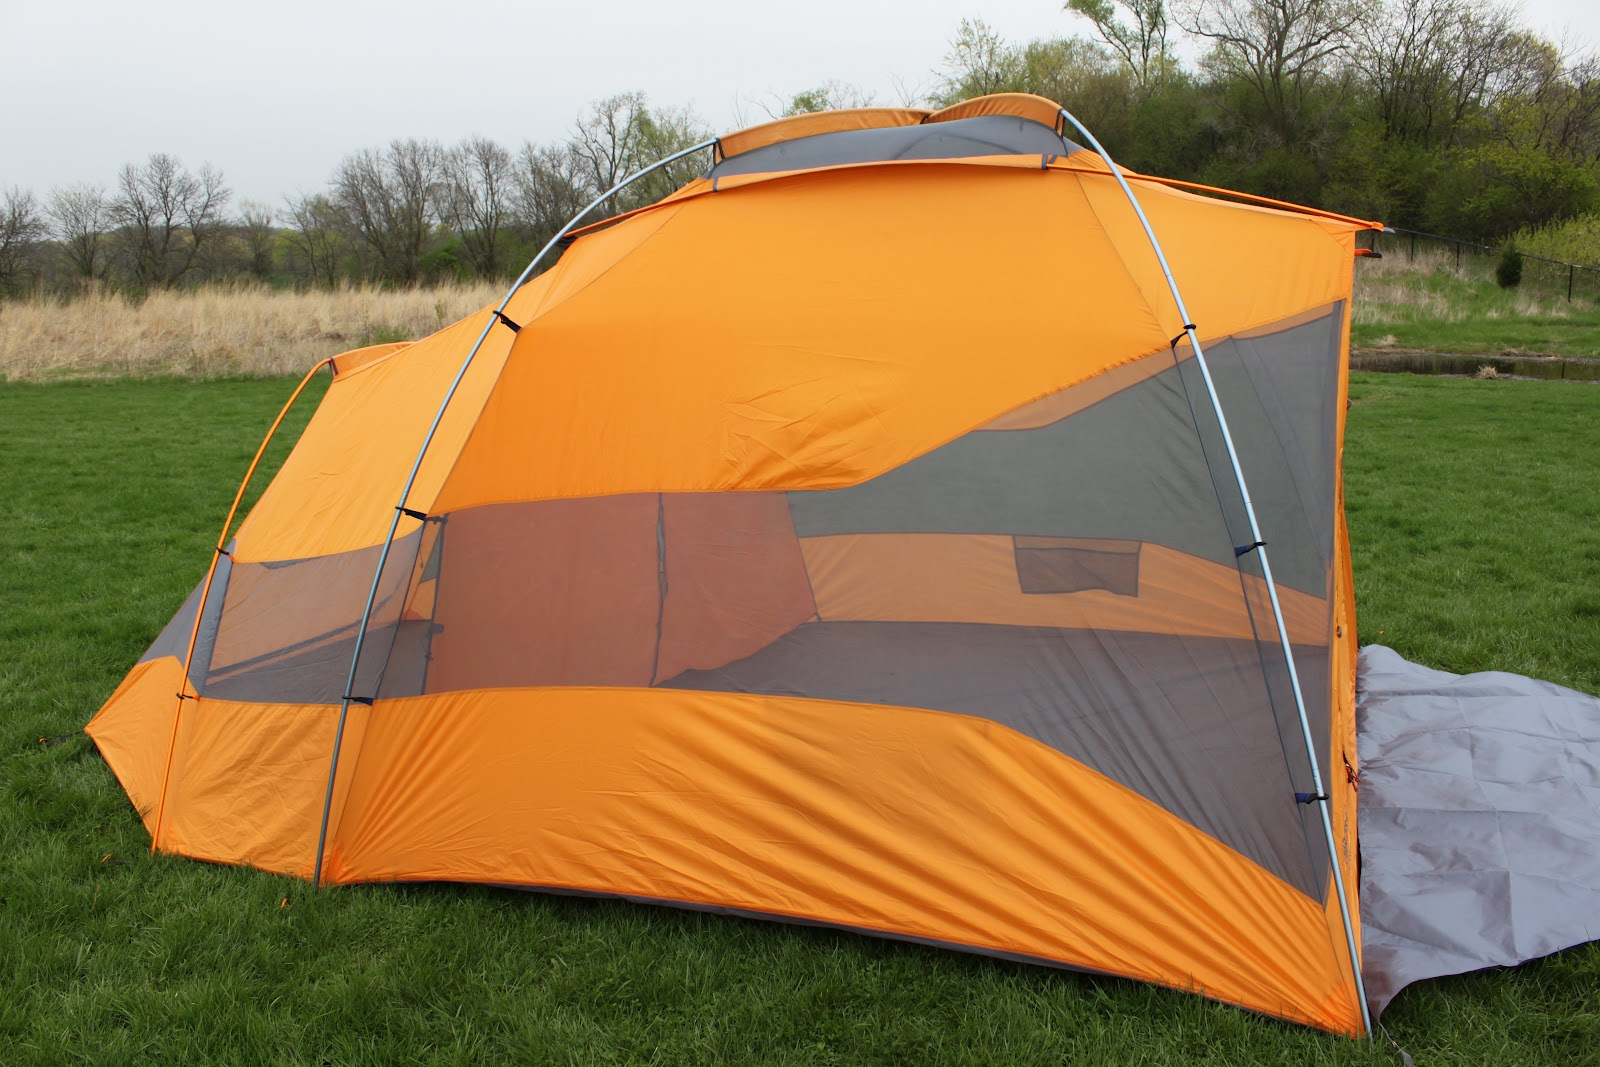 Marmot Capstone Sans Rain Fly & Marmot Tent Reviews u0026 Tall And Spacious The Marmot Limestone 6 Is ...